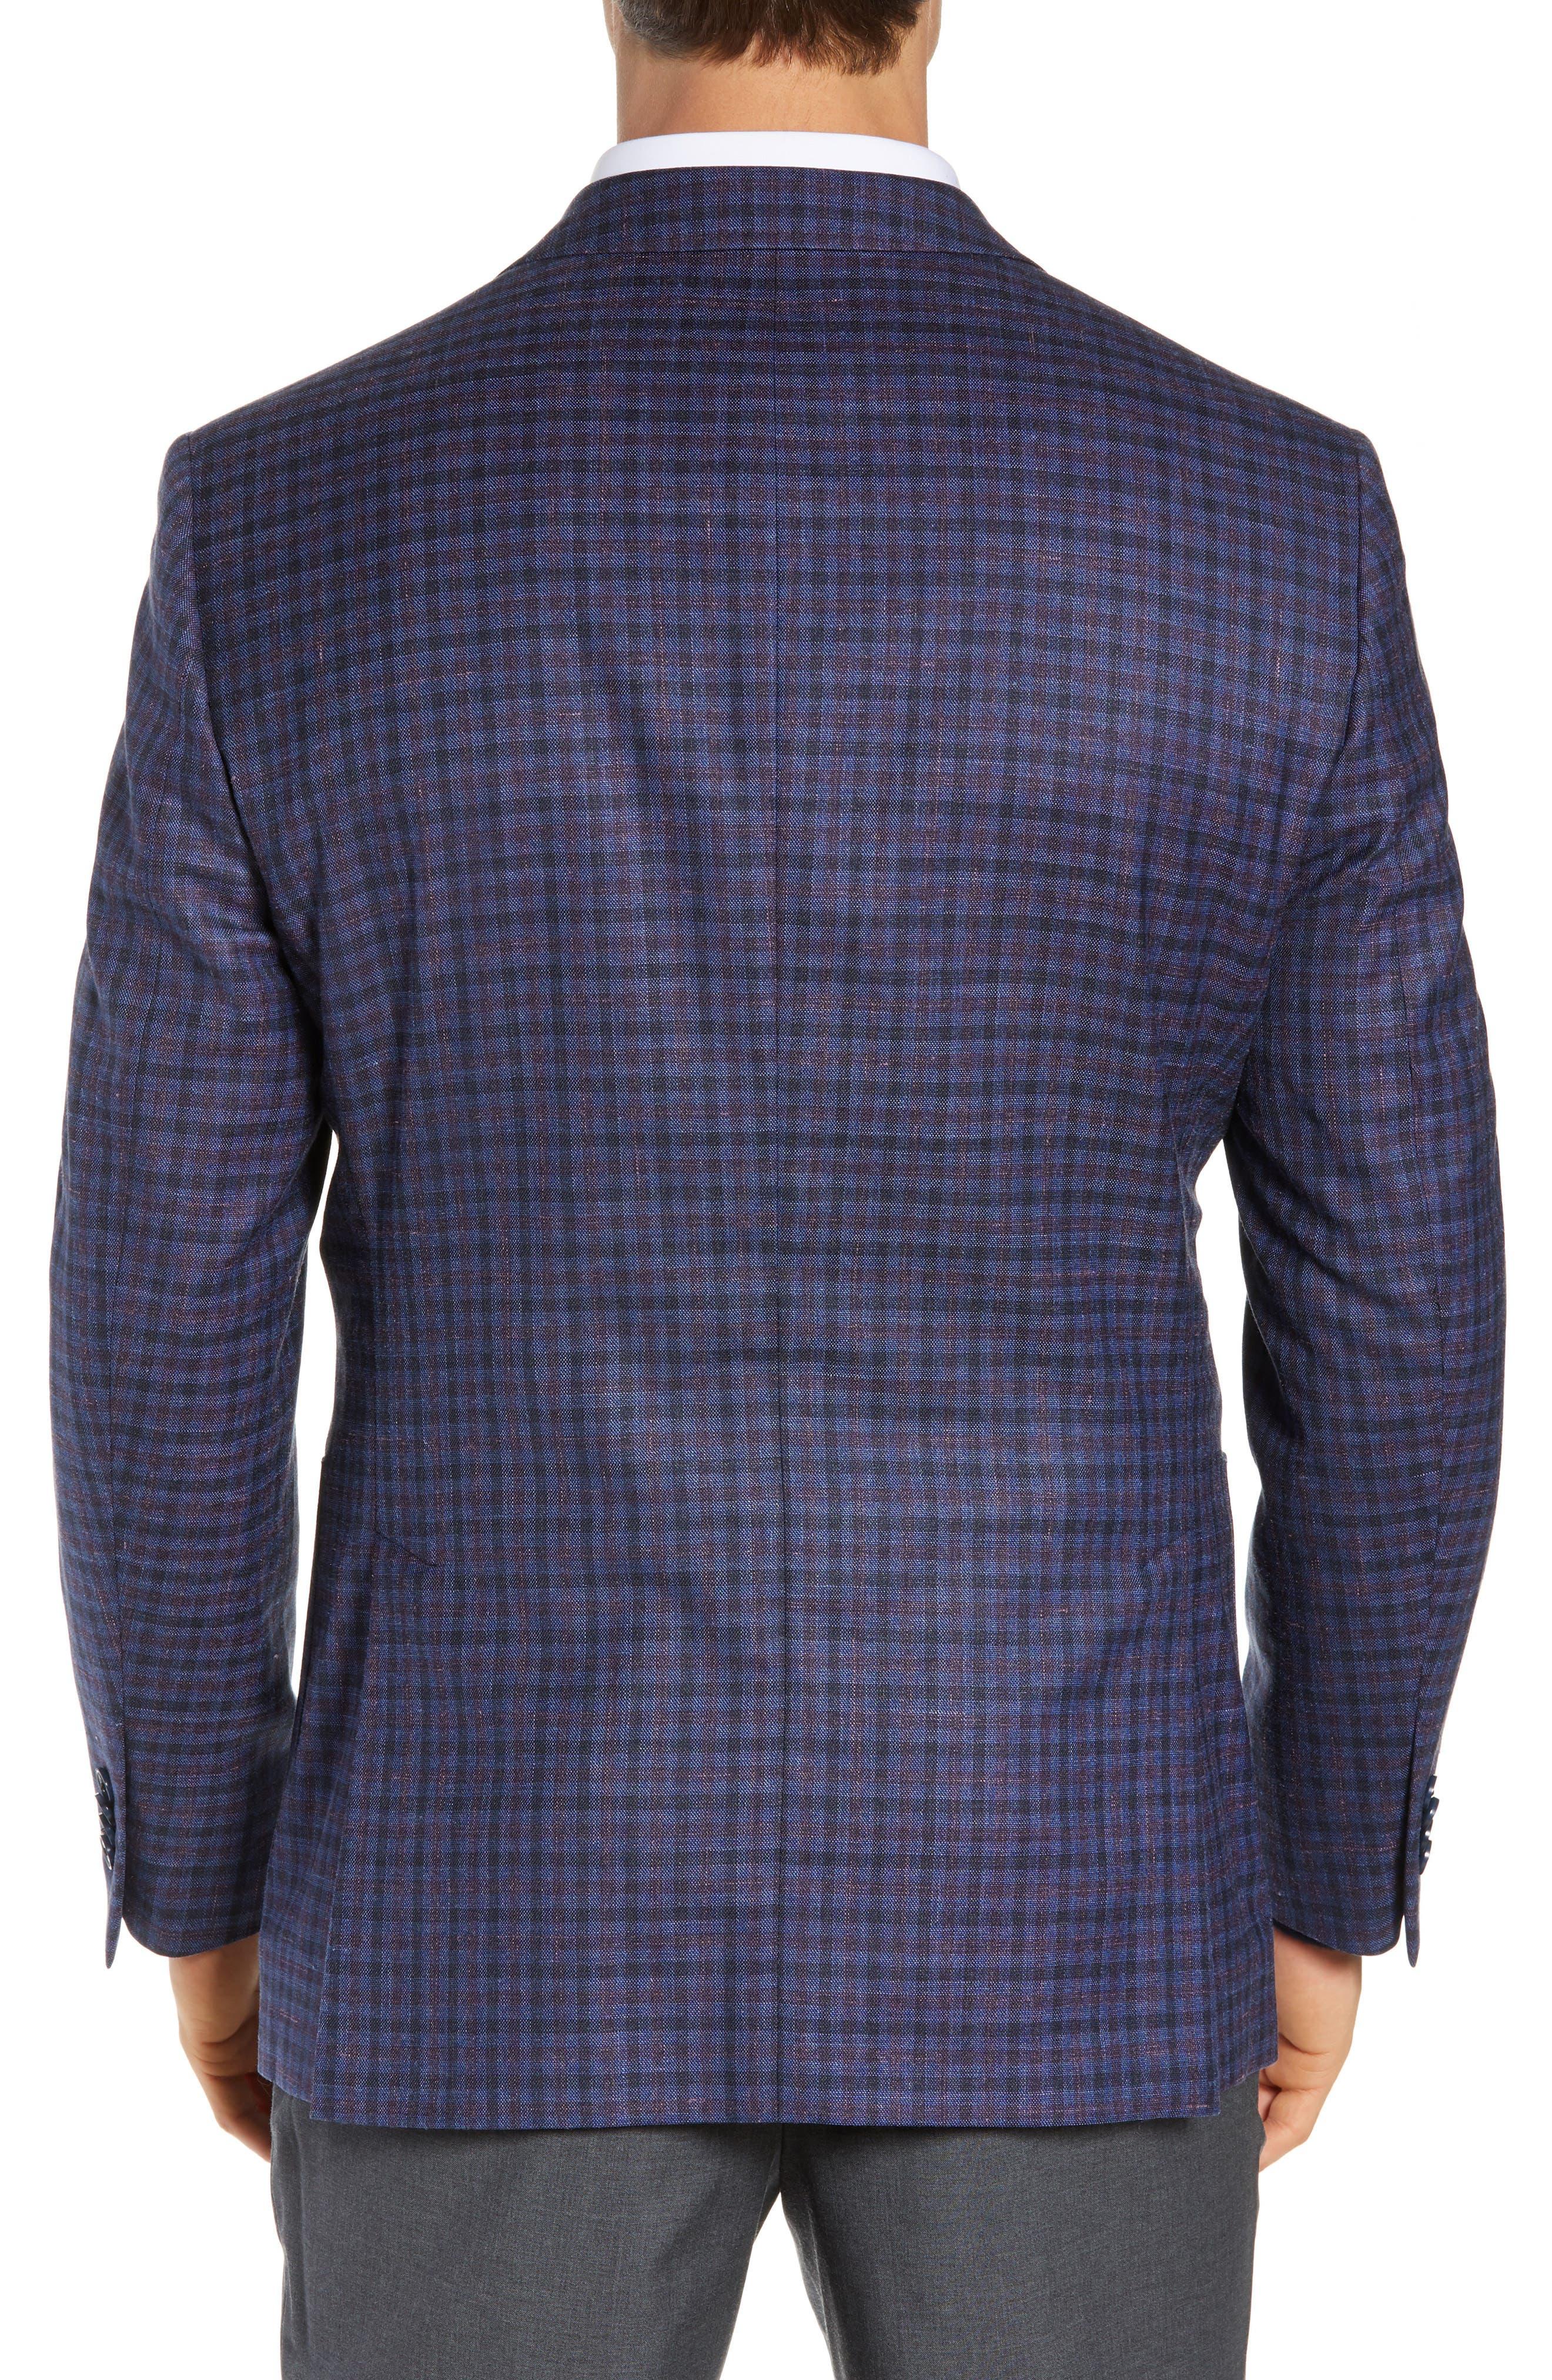 PETER MILLAR, Hyperlight Classic Fit Check Wool Blend Sport Coat, Alternate thumbnail 2, color, BLUE